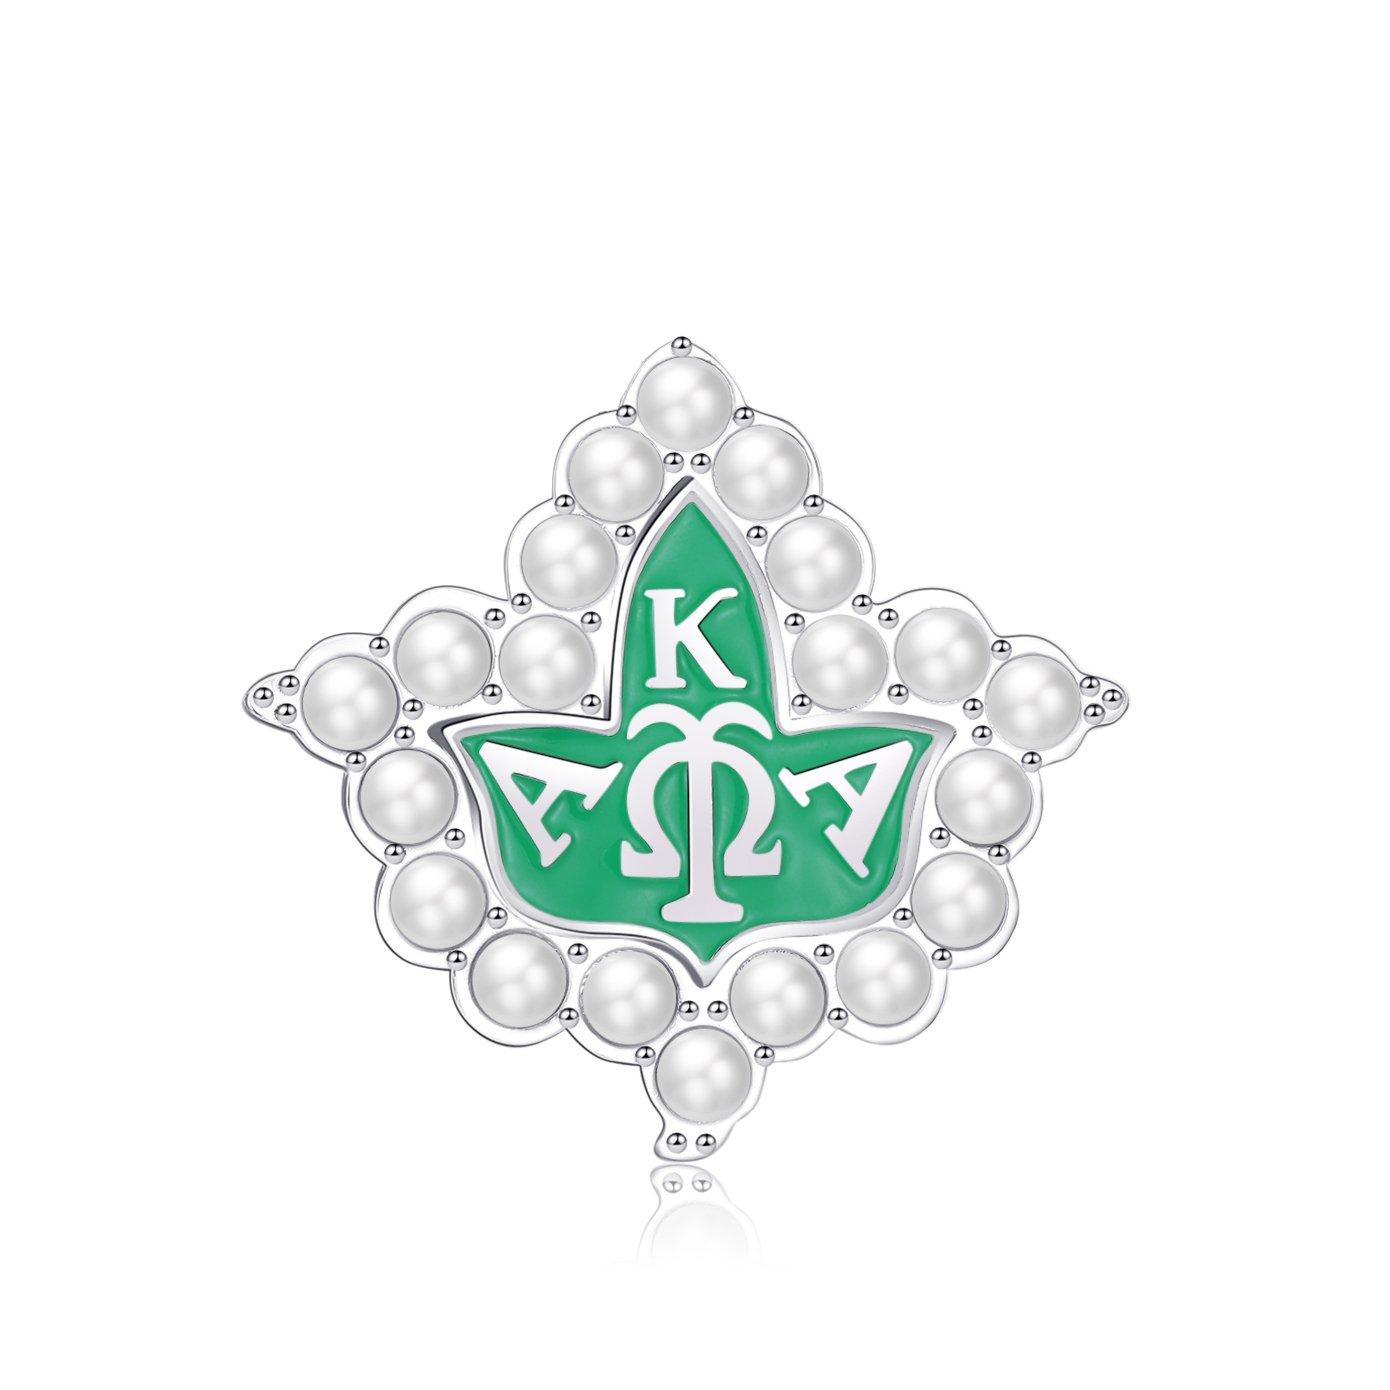 KINGSIN AKA Sorority Gifts, Vintage Pearl Brooch for Women Alpha Kappa Alpha Paraphernalia Leaf Pins